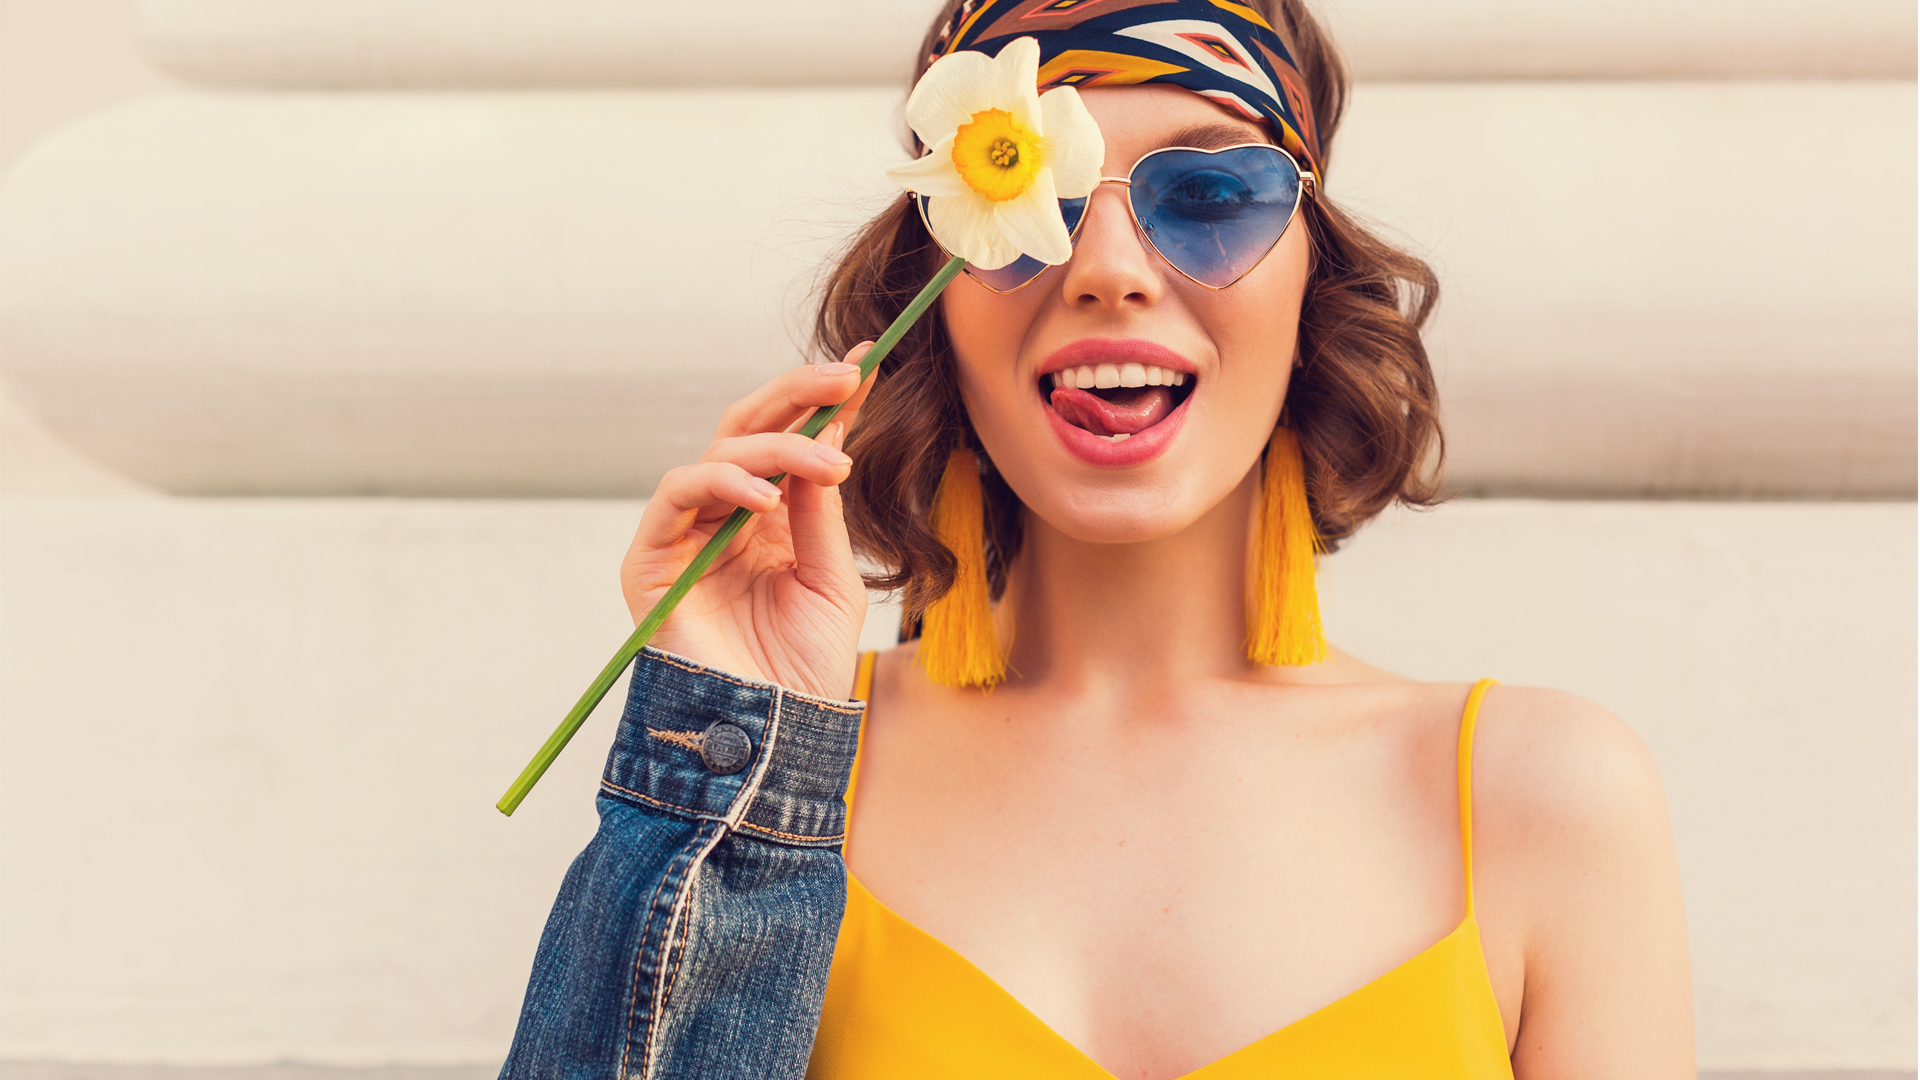 Blog Artikel 39 - Stilvolle Mode